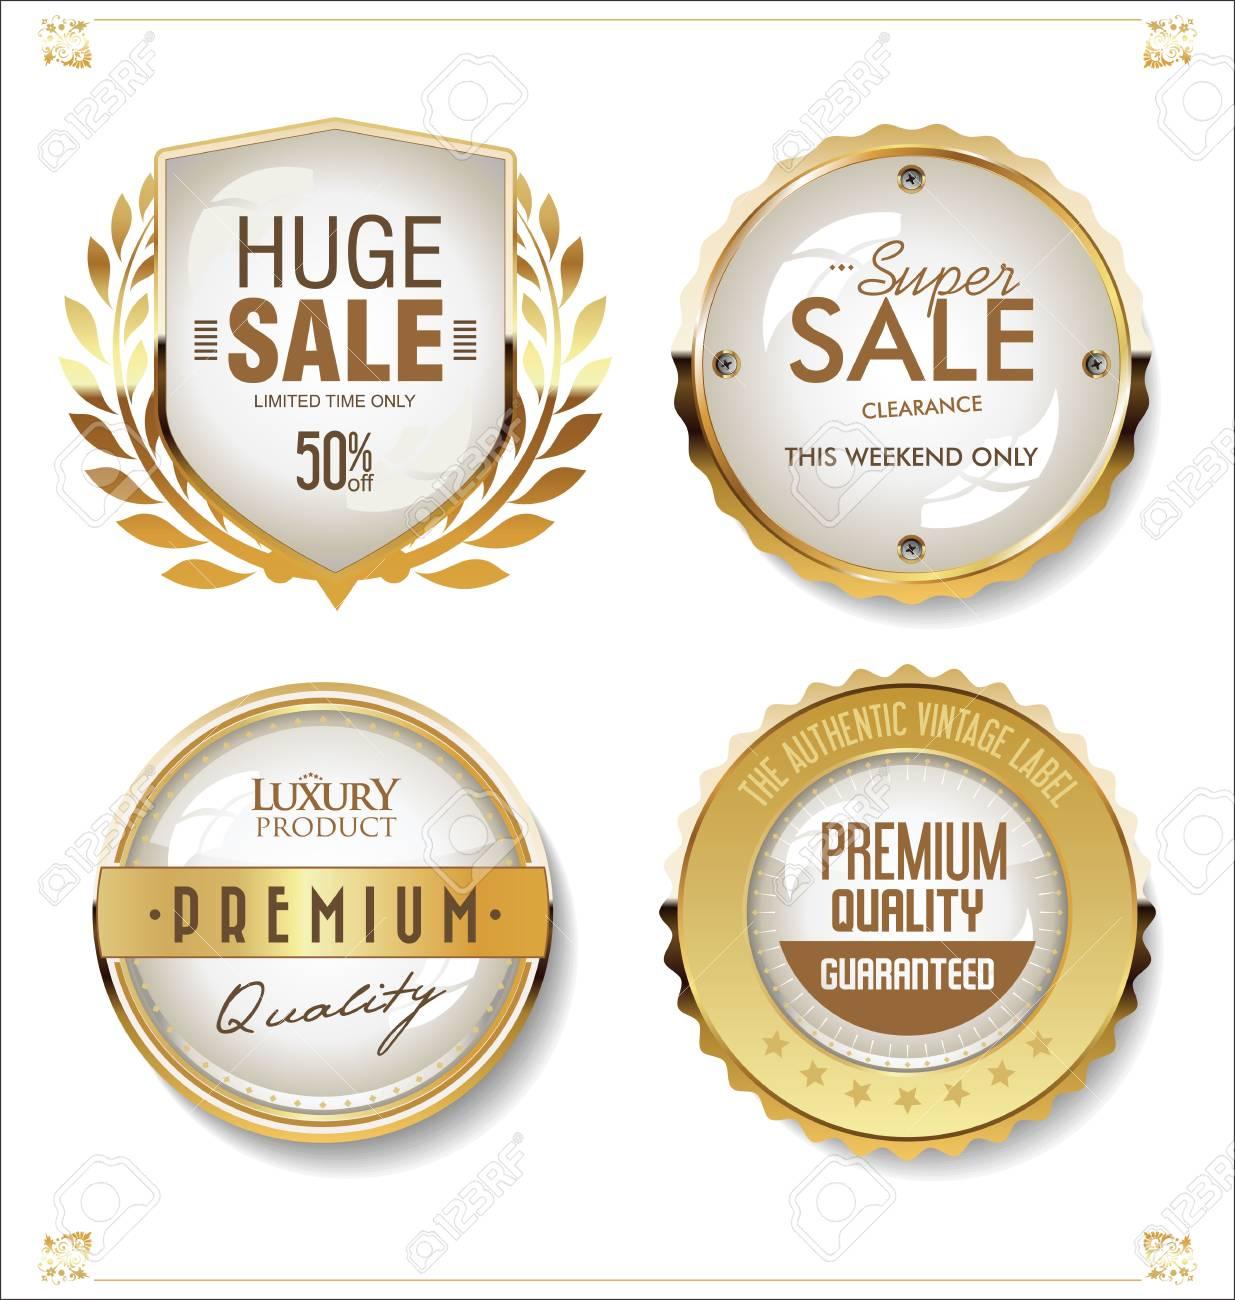 Luxury premium golden badges and labels - 125504993